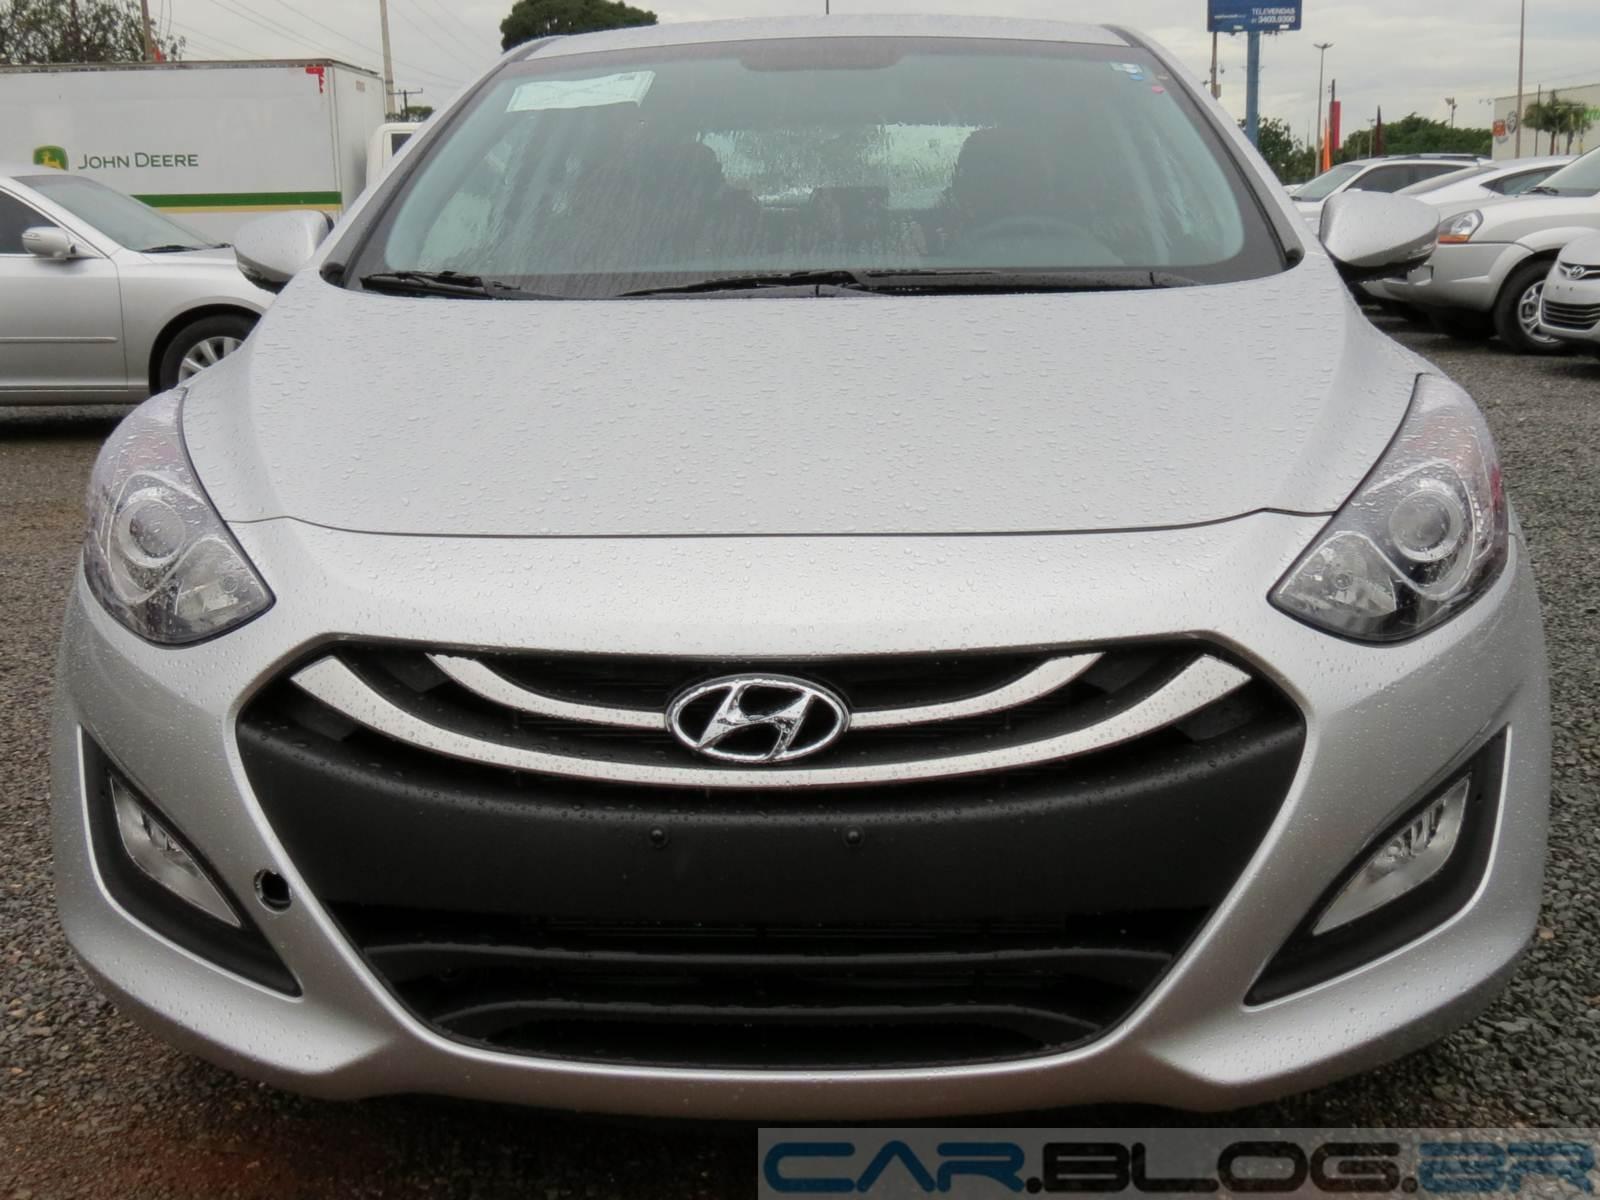 Novo Hyundai i30 2014 1.8